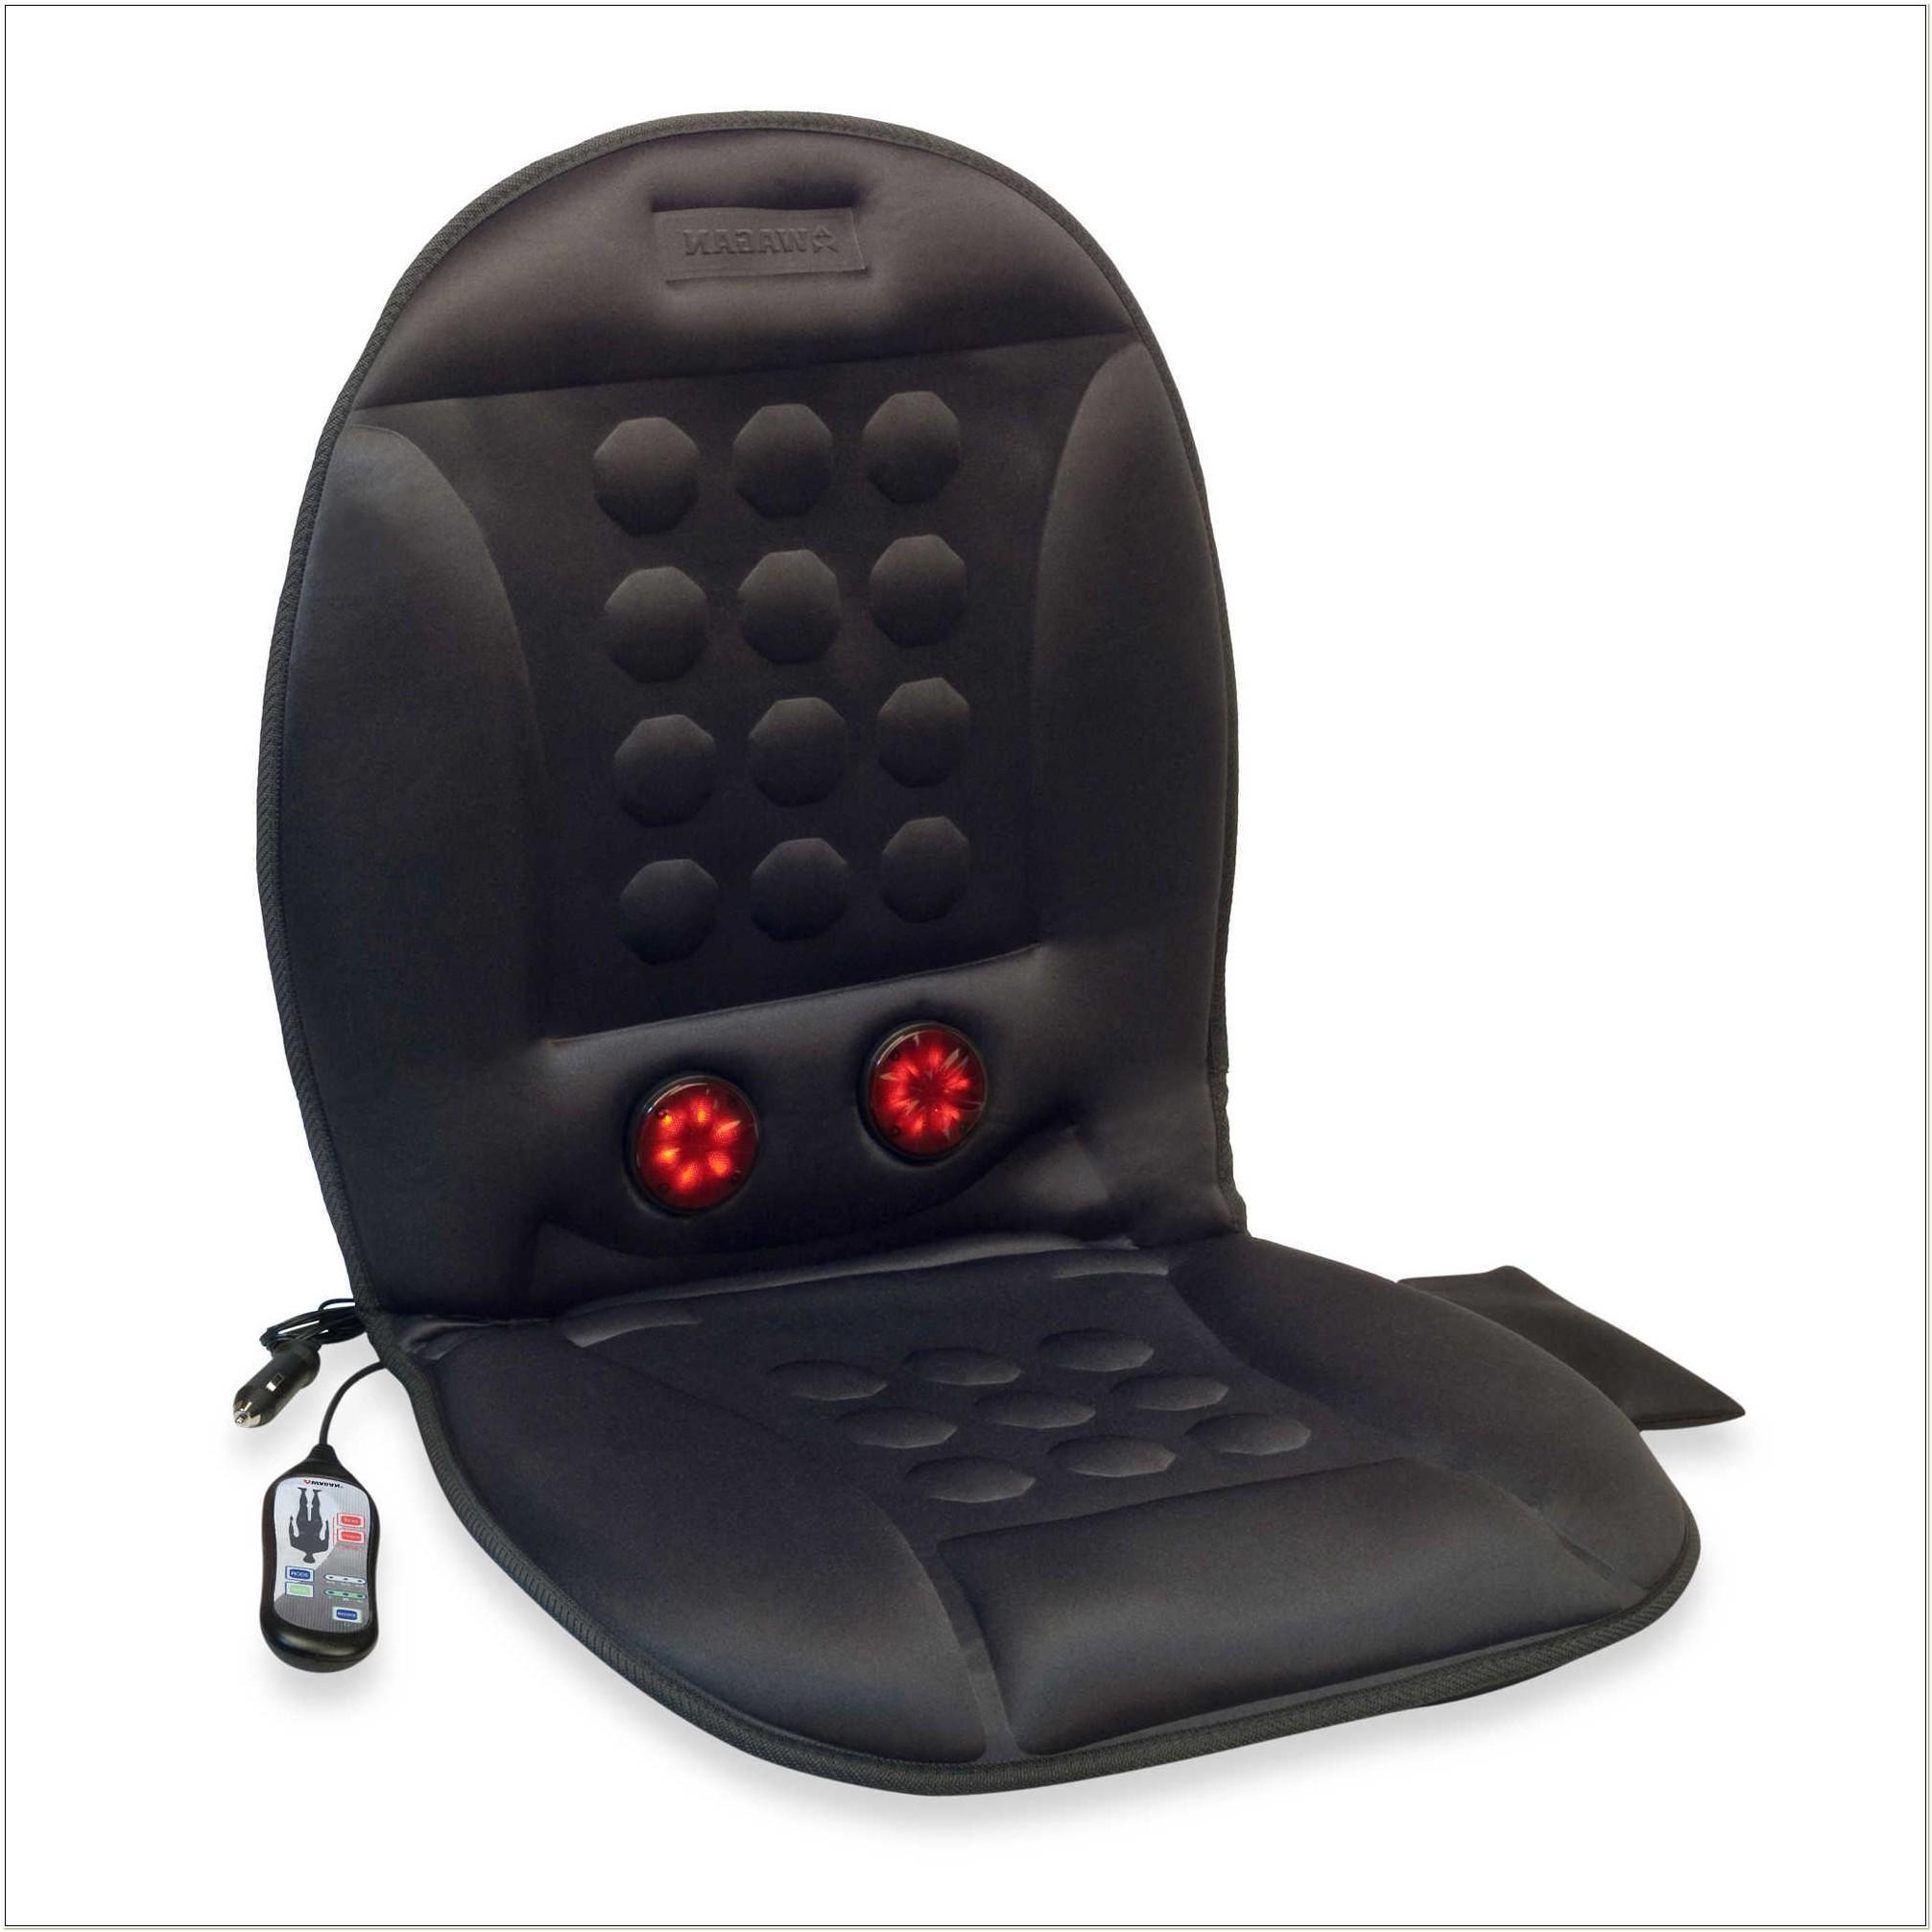 Desk Chair Massage Pad